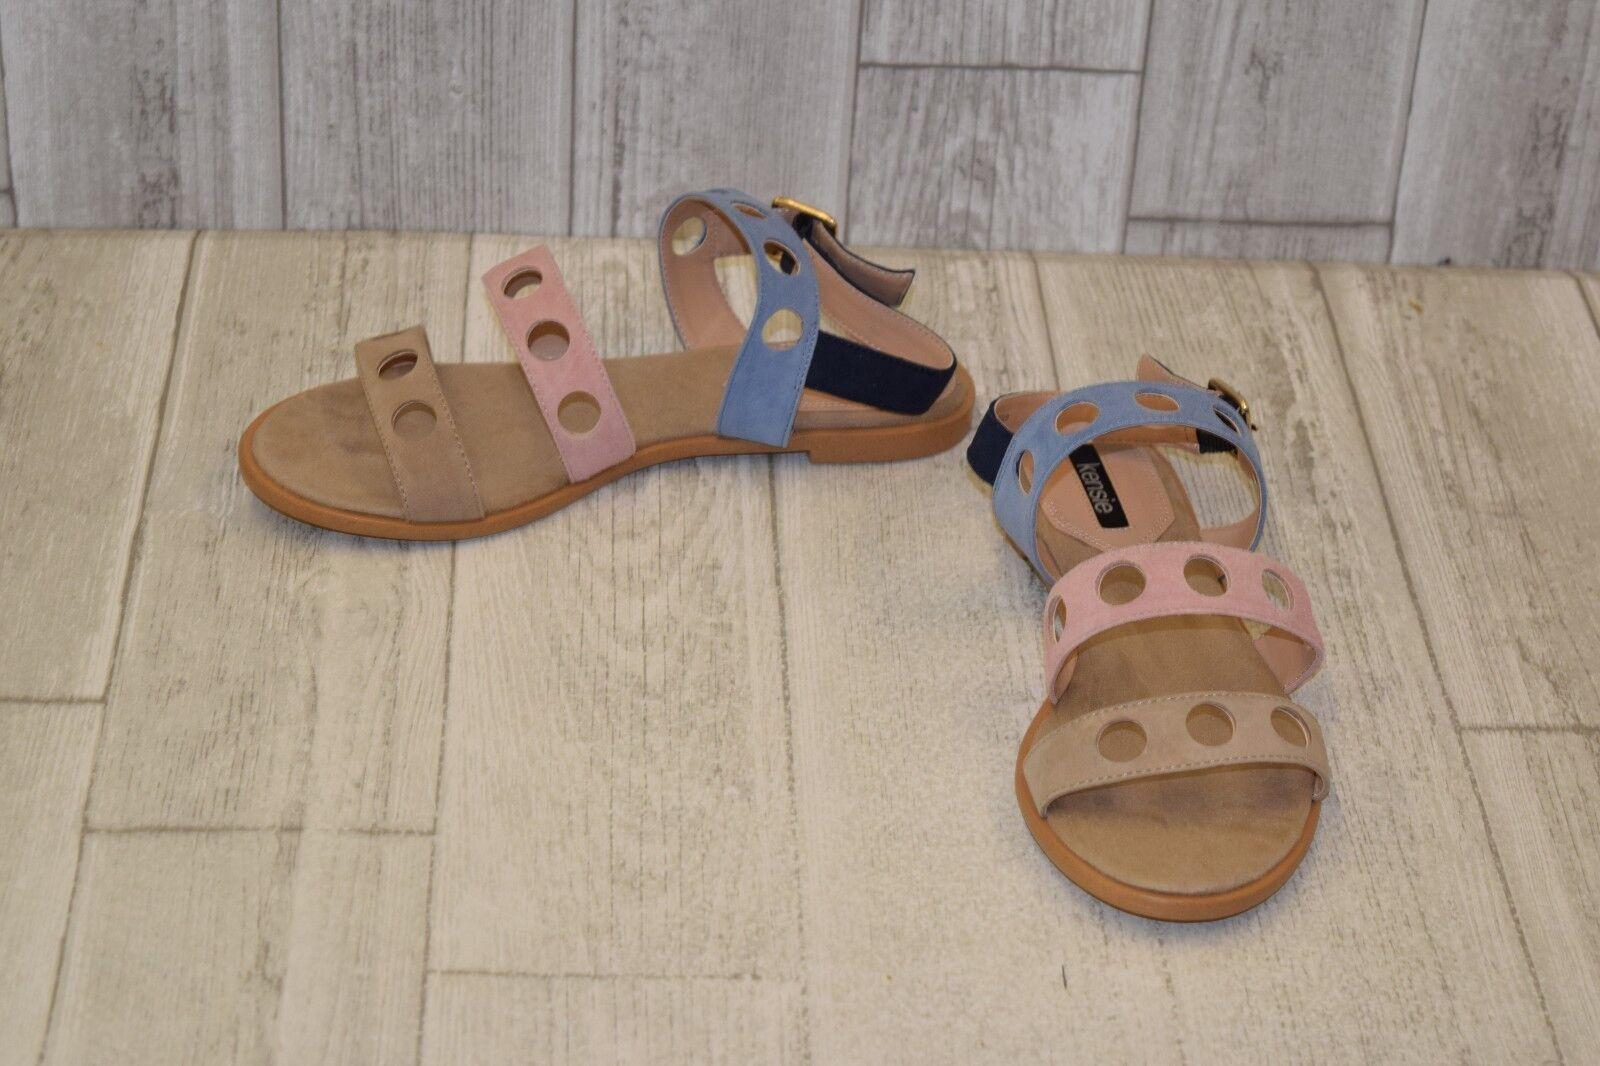 Kensie Marigold Suede Sandal, Women's Size 7.5 M, Pastel multi